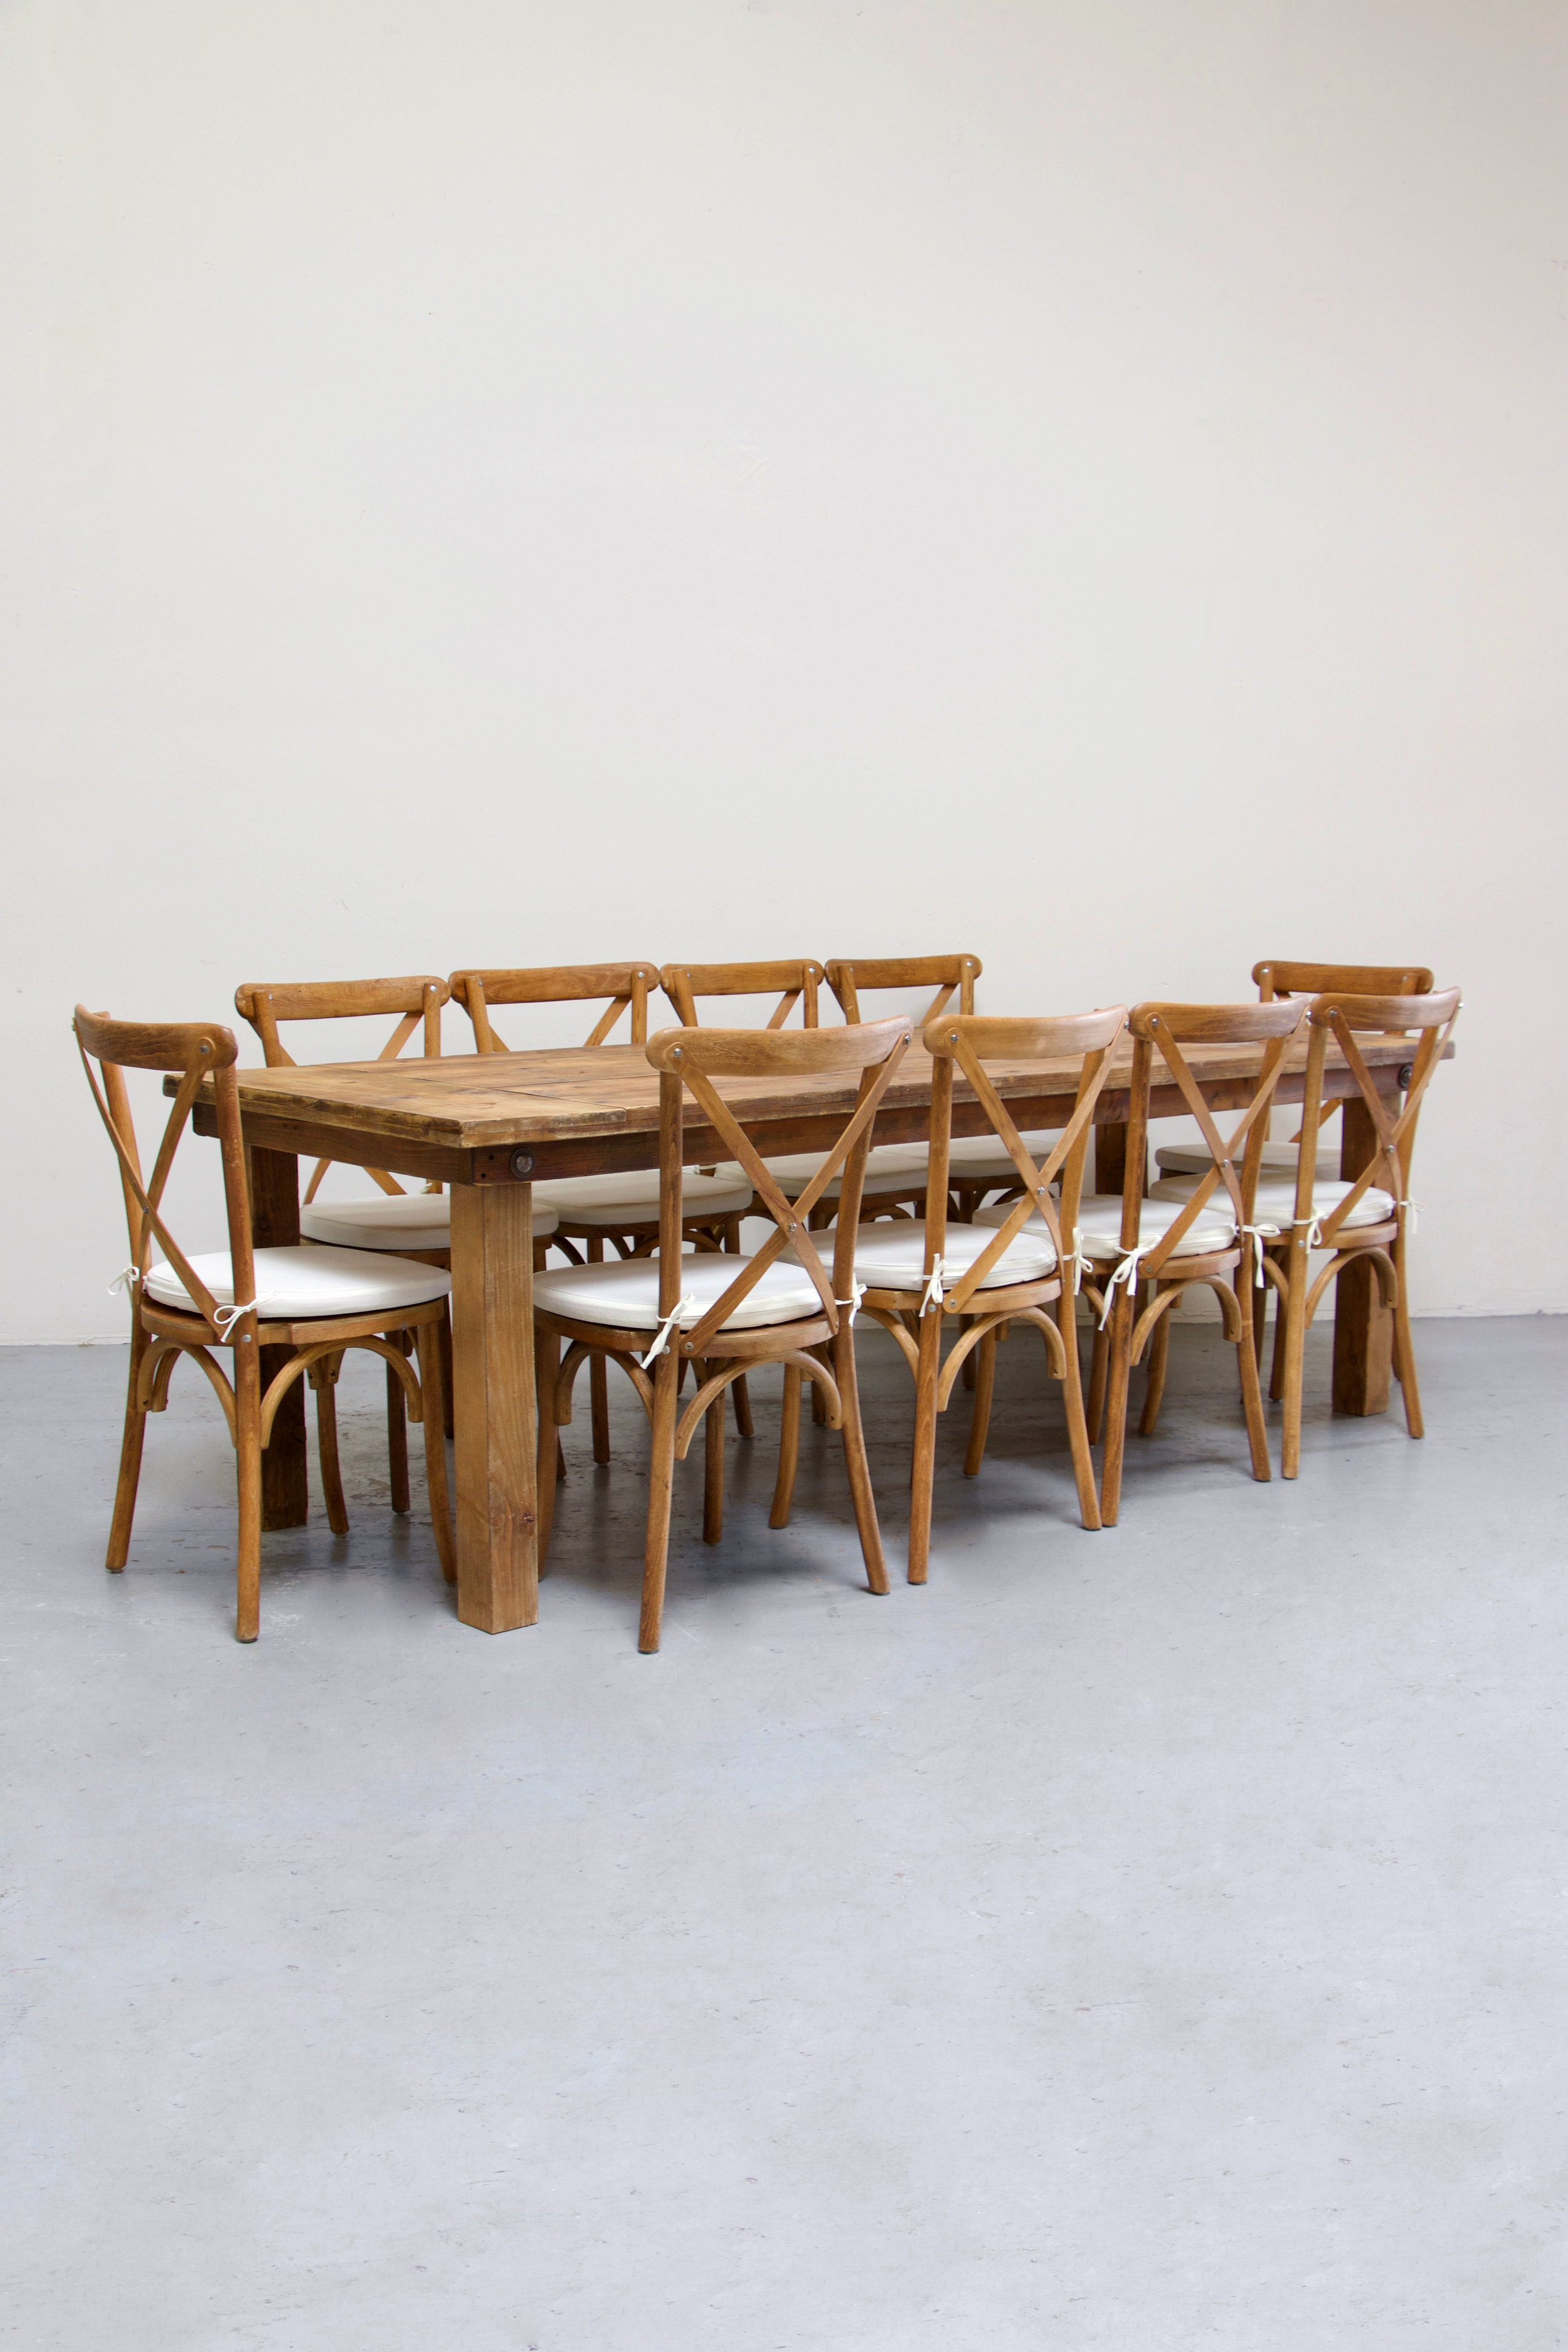 $160 1 Honey Brown Farm Table w/ 10 Cross-Back Chairs